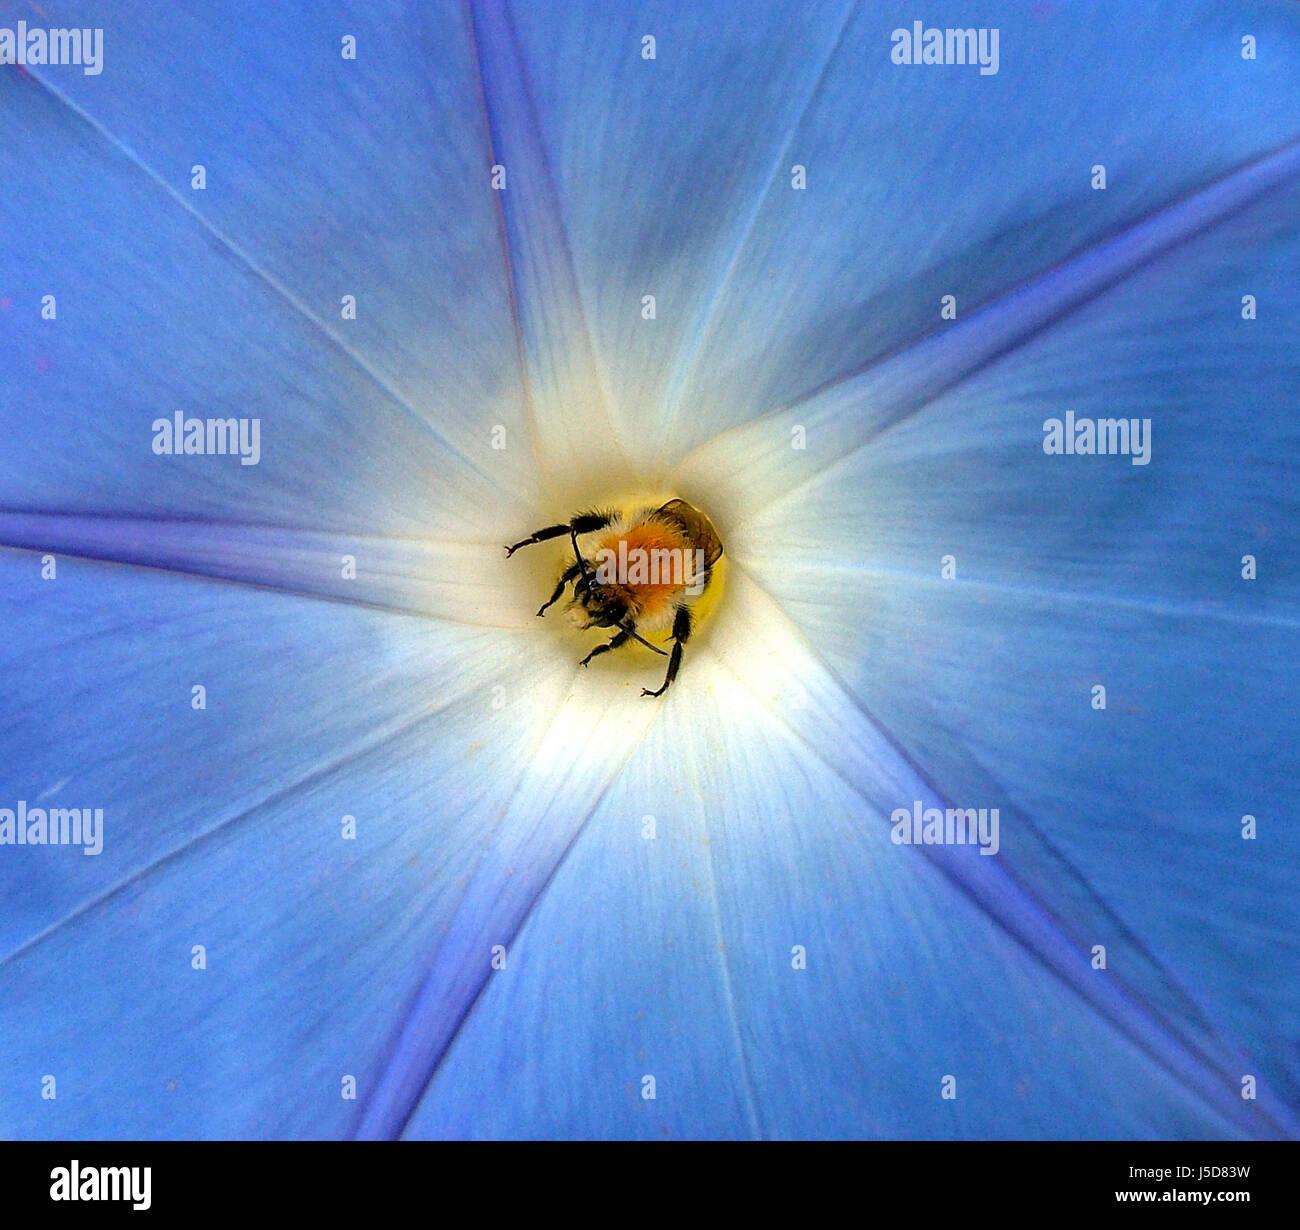 hummel roost (edited) - Stock Image